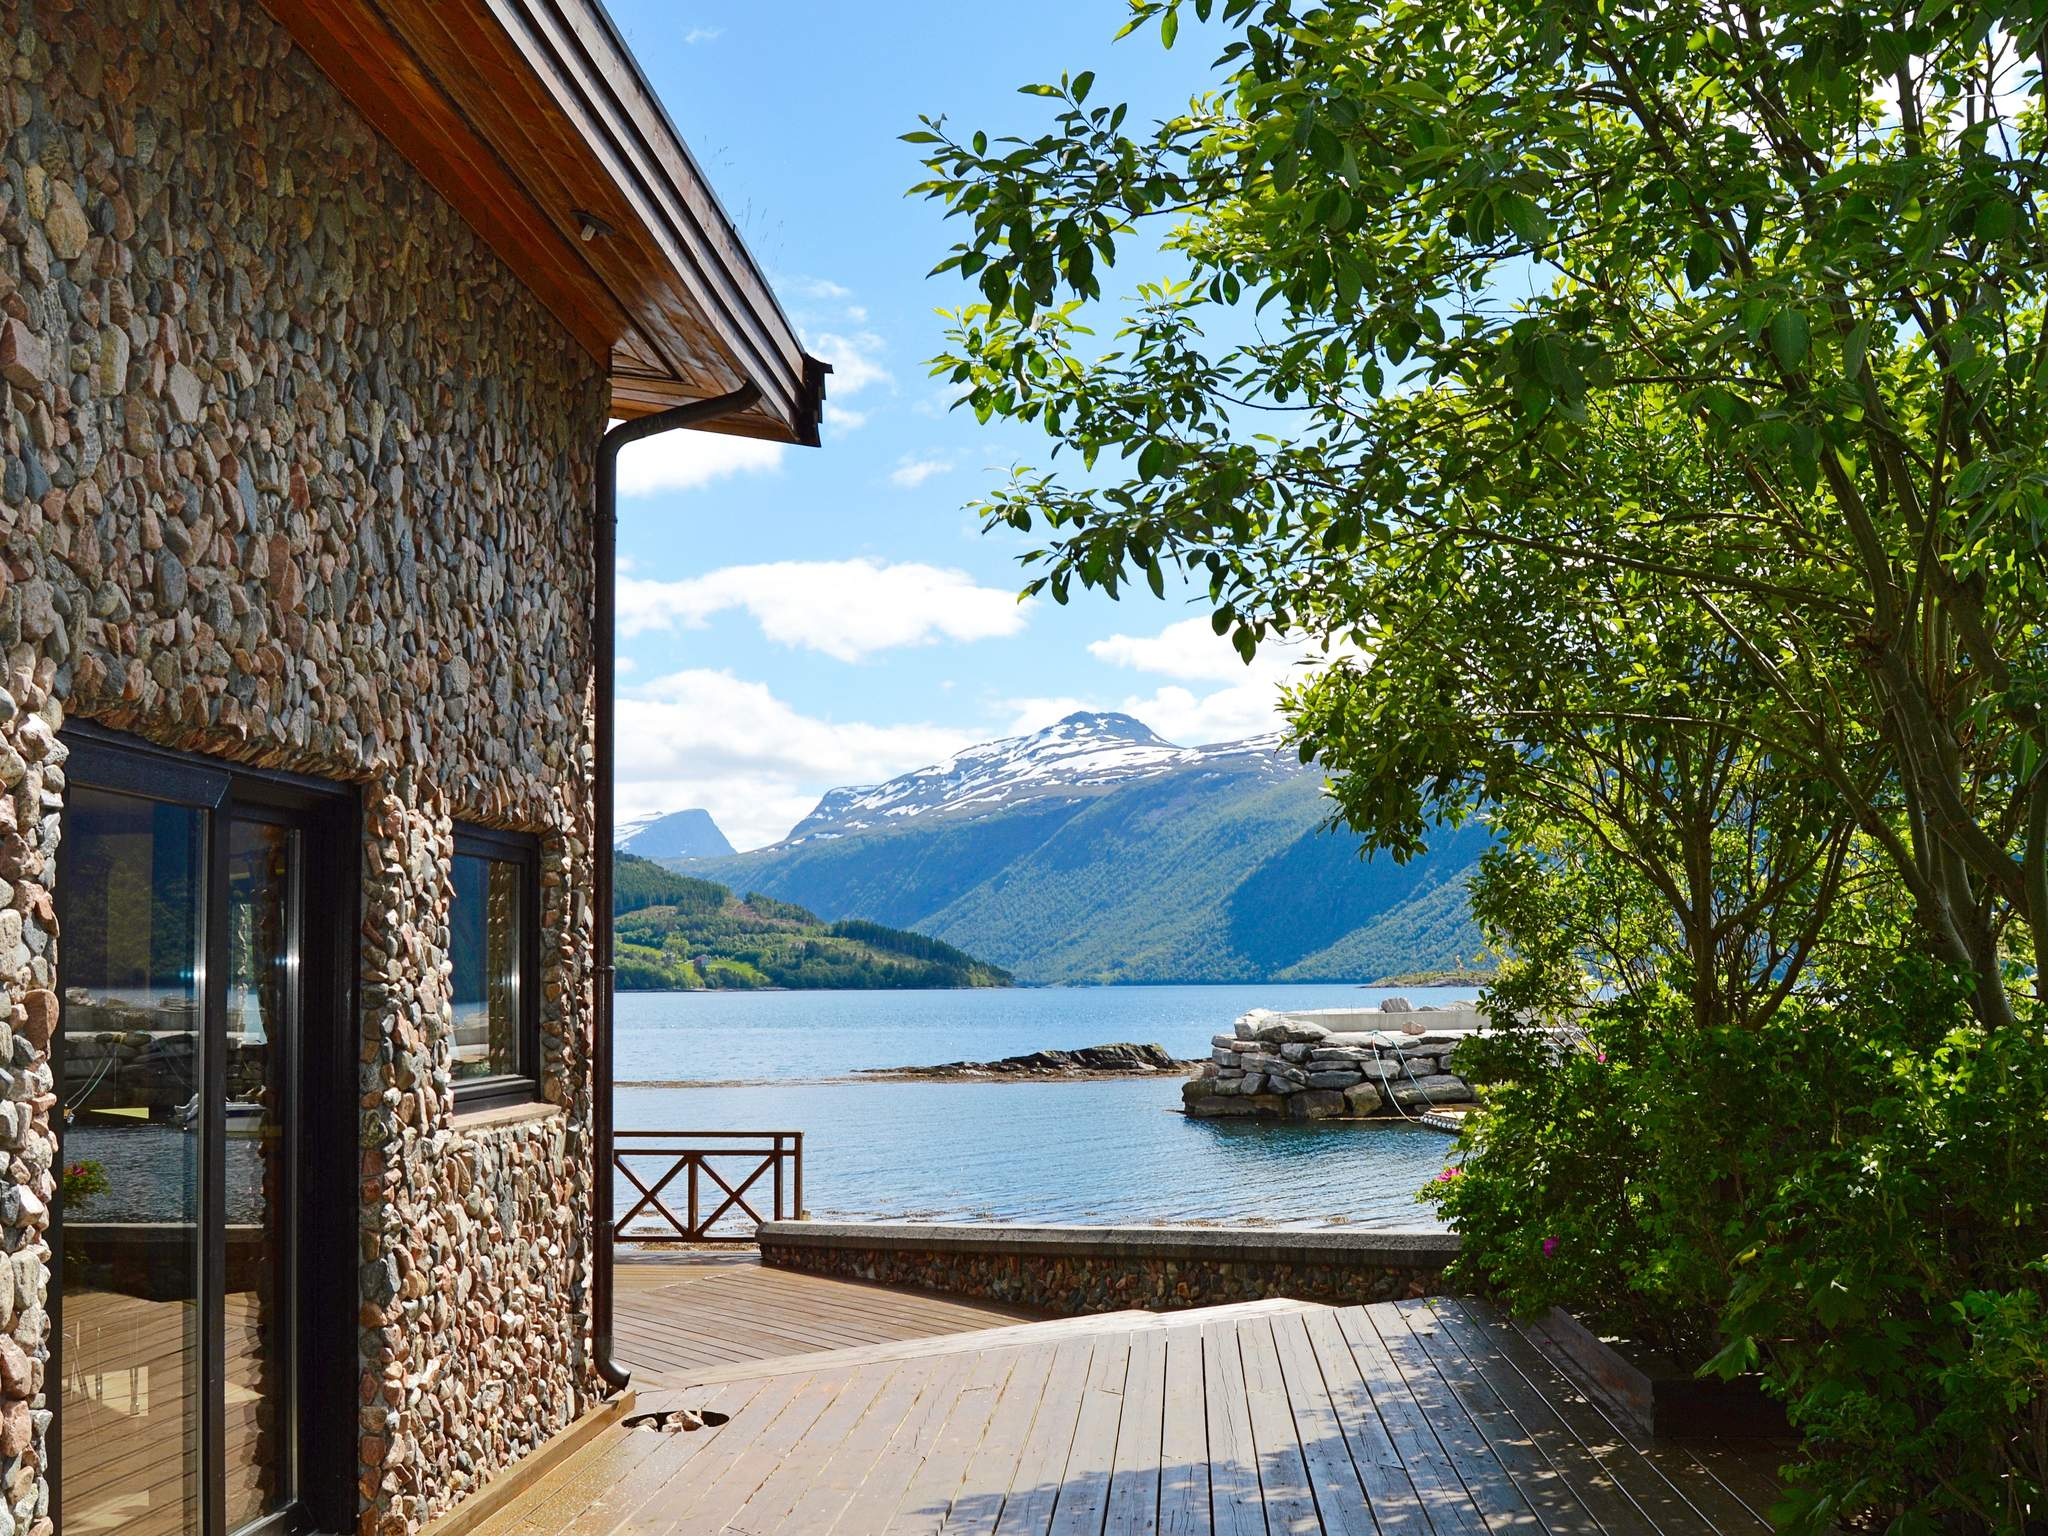 Ferienhaus Eidsvåg (84695), Eidsvåg, More - Romsdal, Westnorwegen, Norwegen, Bild 26